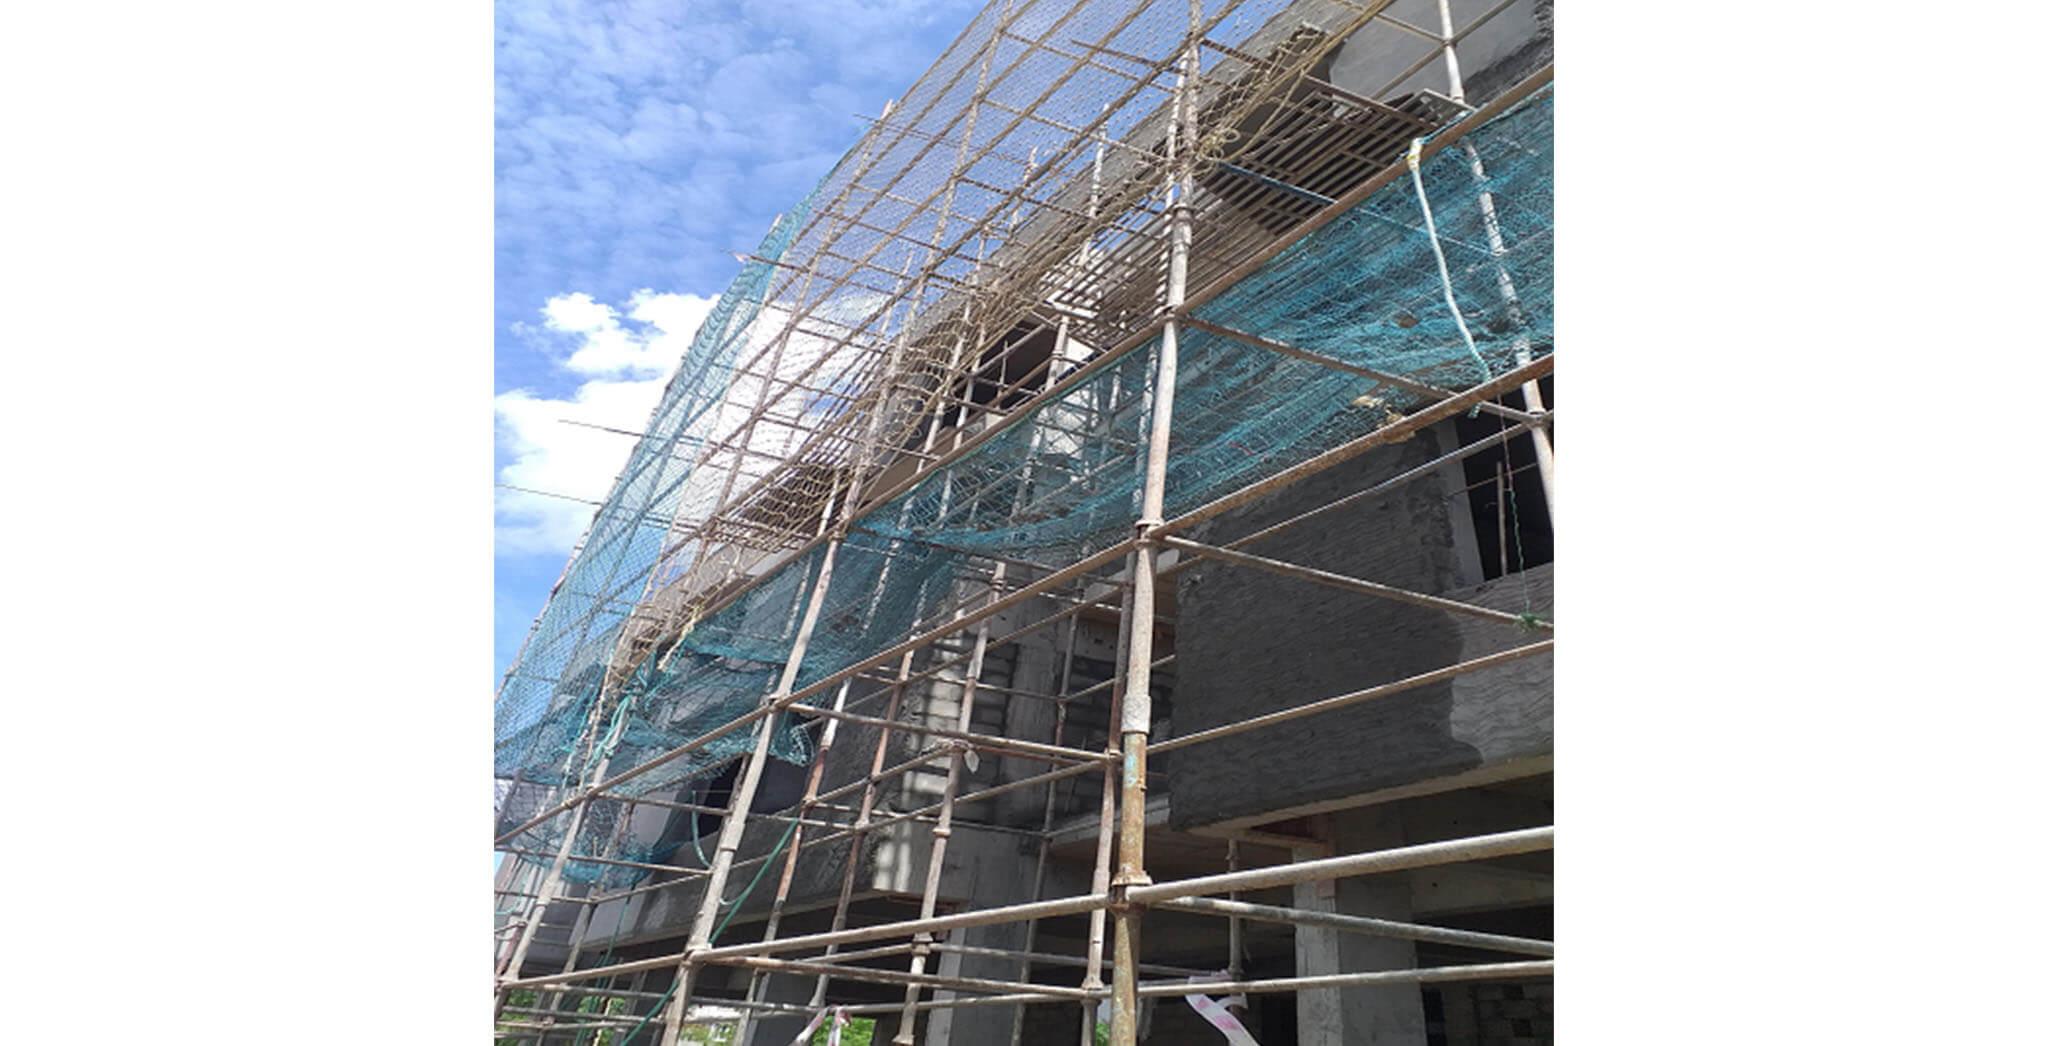 Jun 2021 - North side view: Block B—Northside external plastering work-in-progress